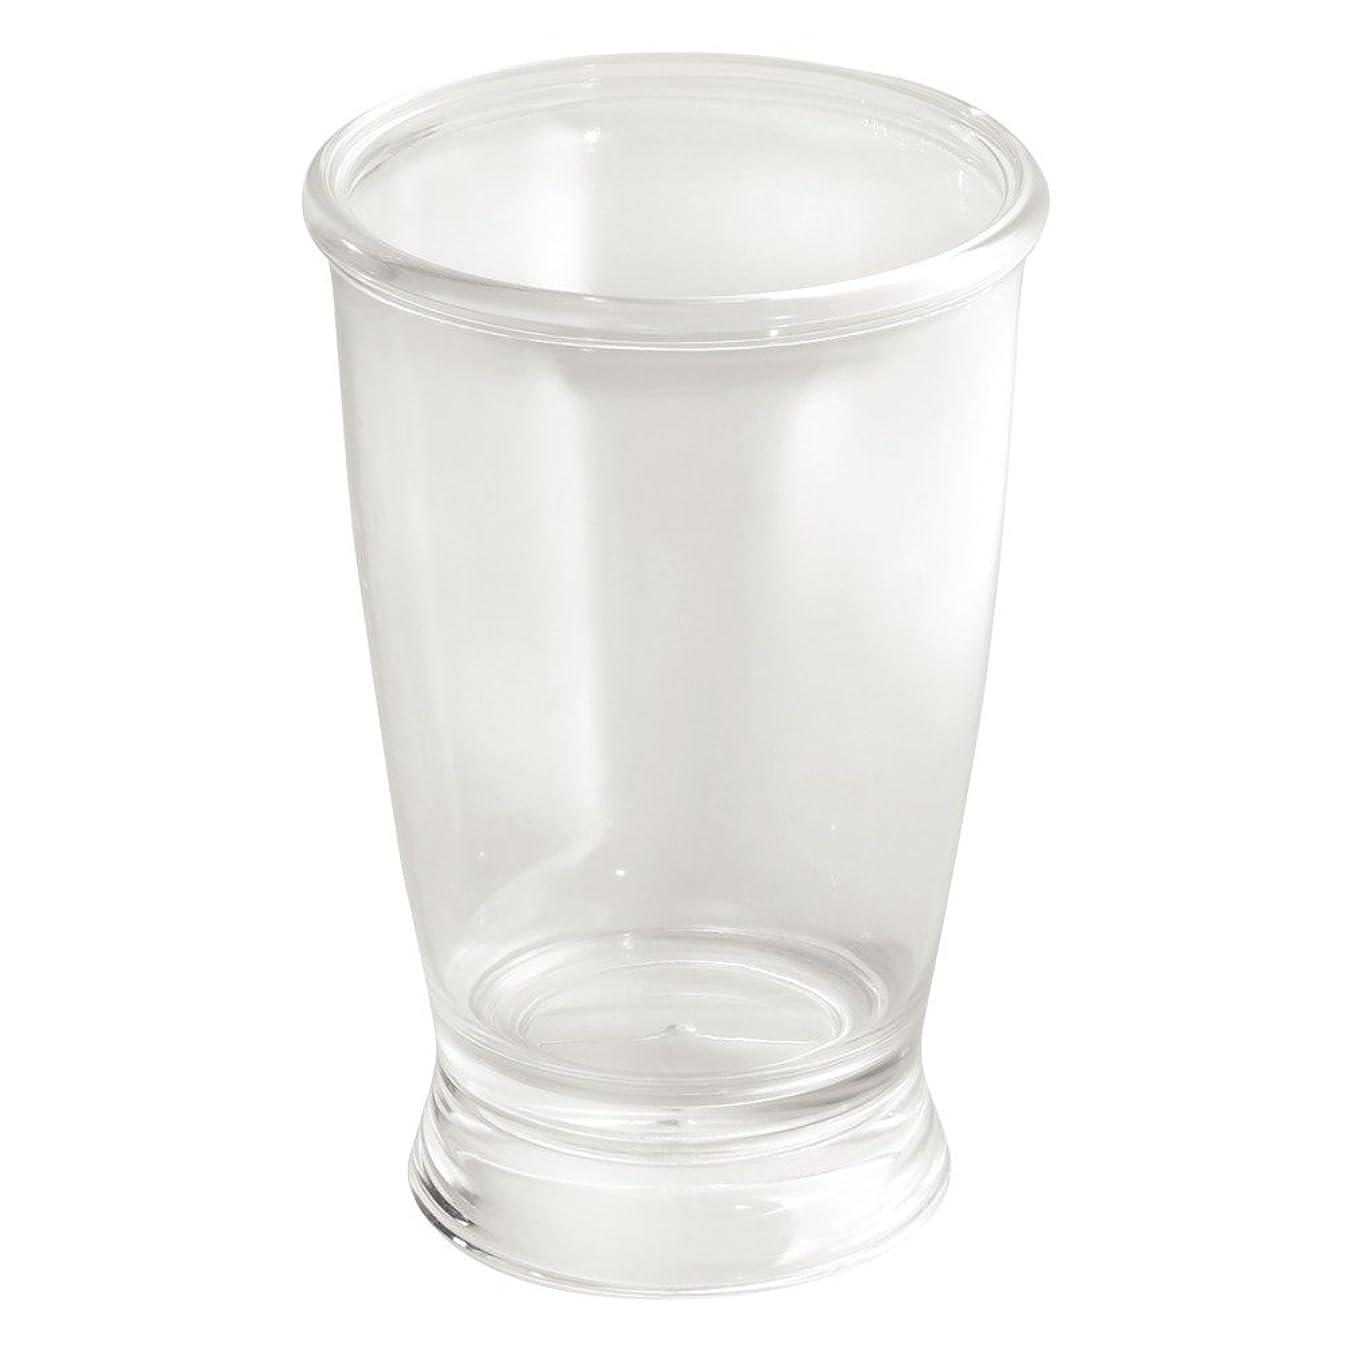 InterDesign Franklin Plastic Tumbler Cup for Bathroom Vanity Countertops - Clear